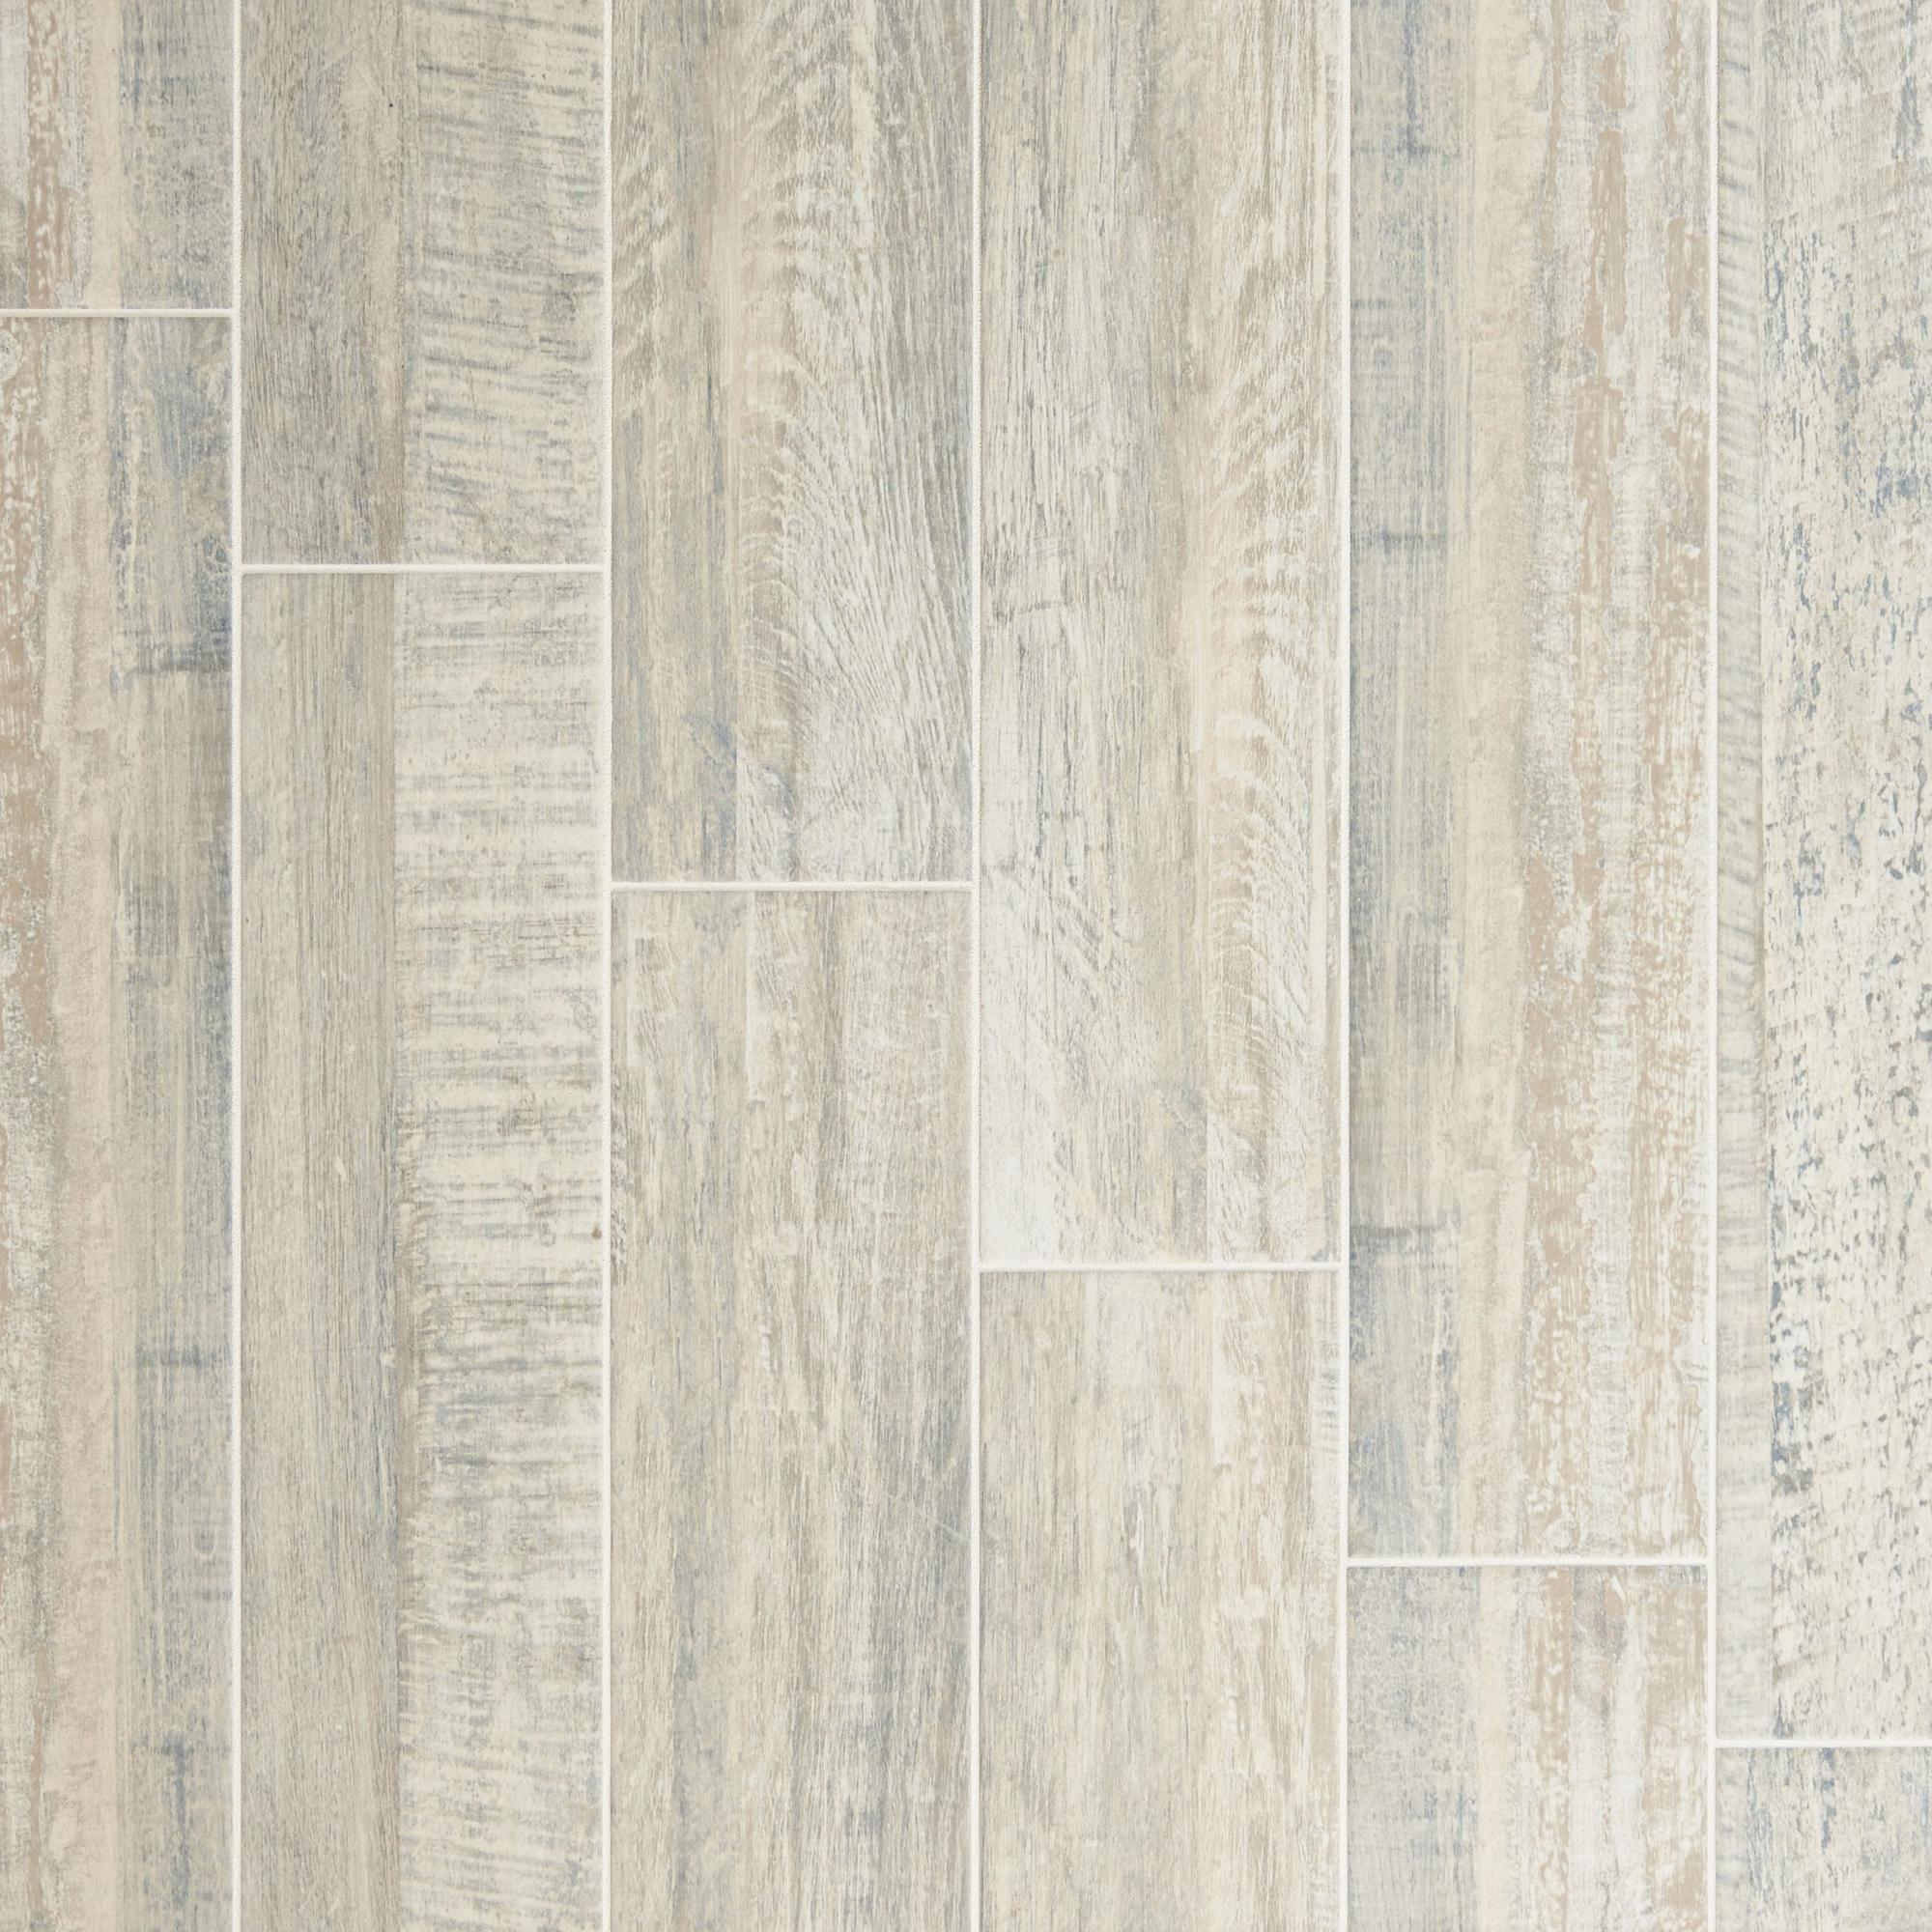 Pier White Wood Plank Porcelain Tile  6 X 36